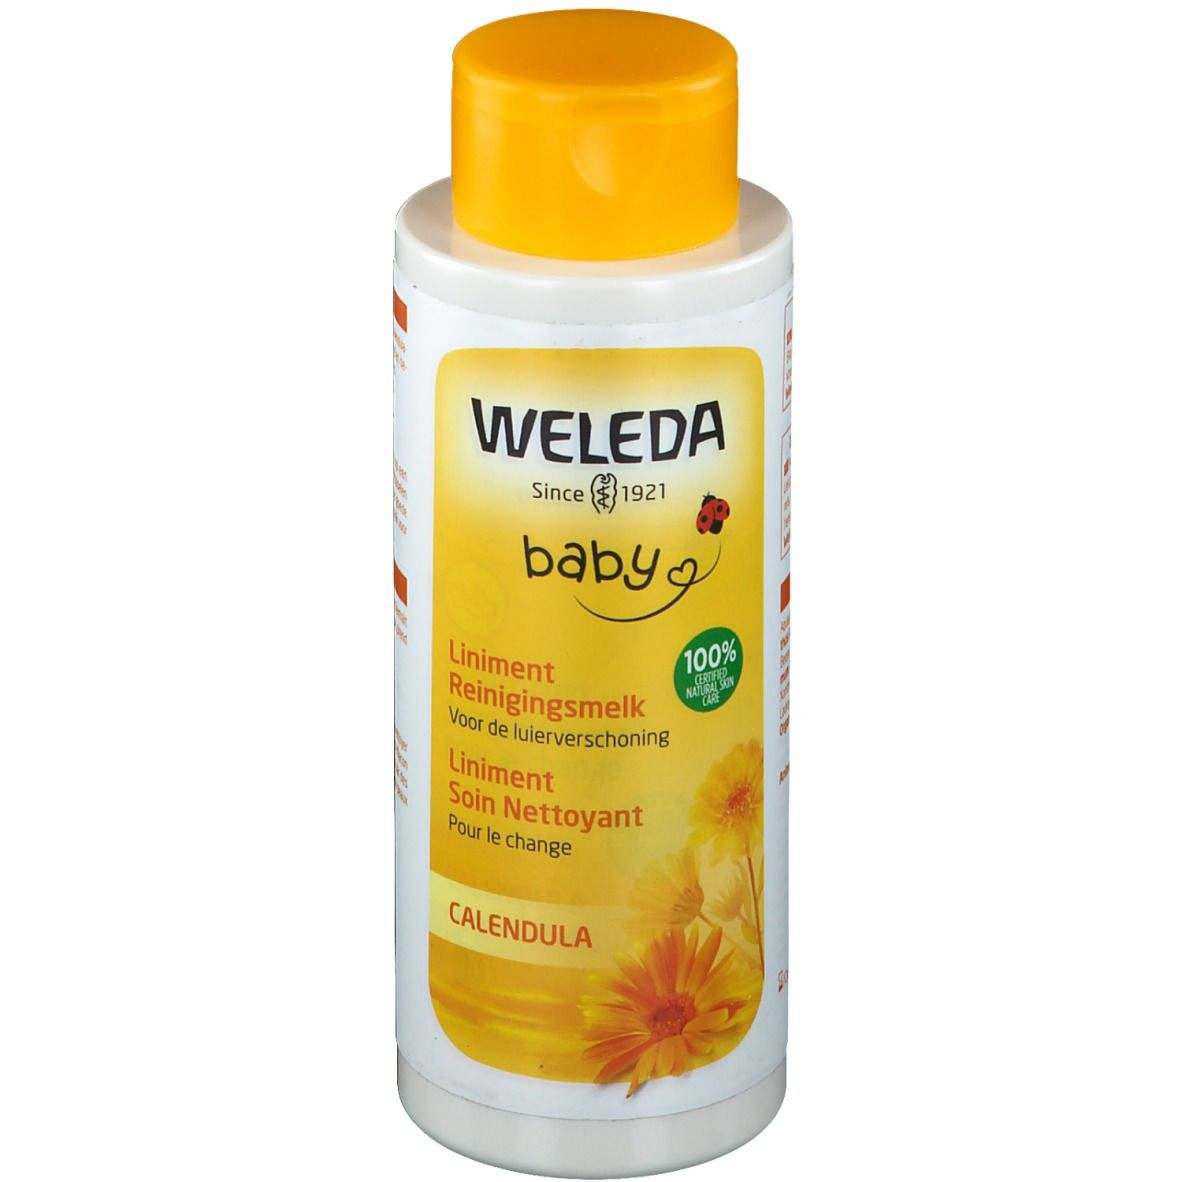 Image of Weleda Baby Liniment Soin nettoyant pour le Change Calendula